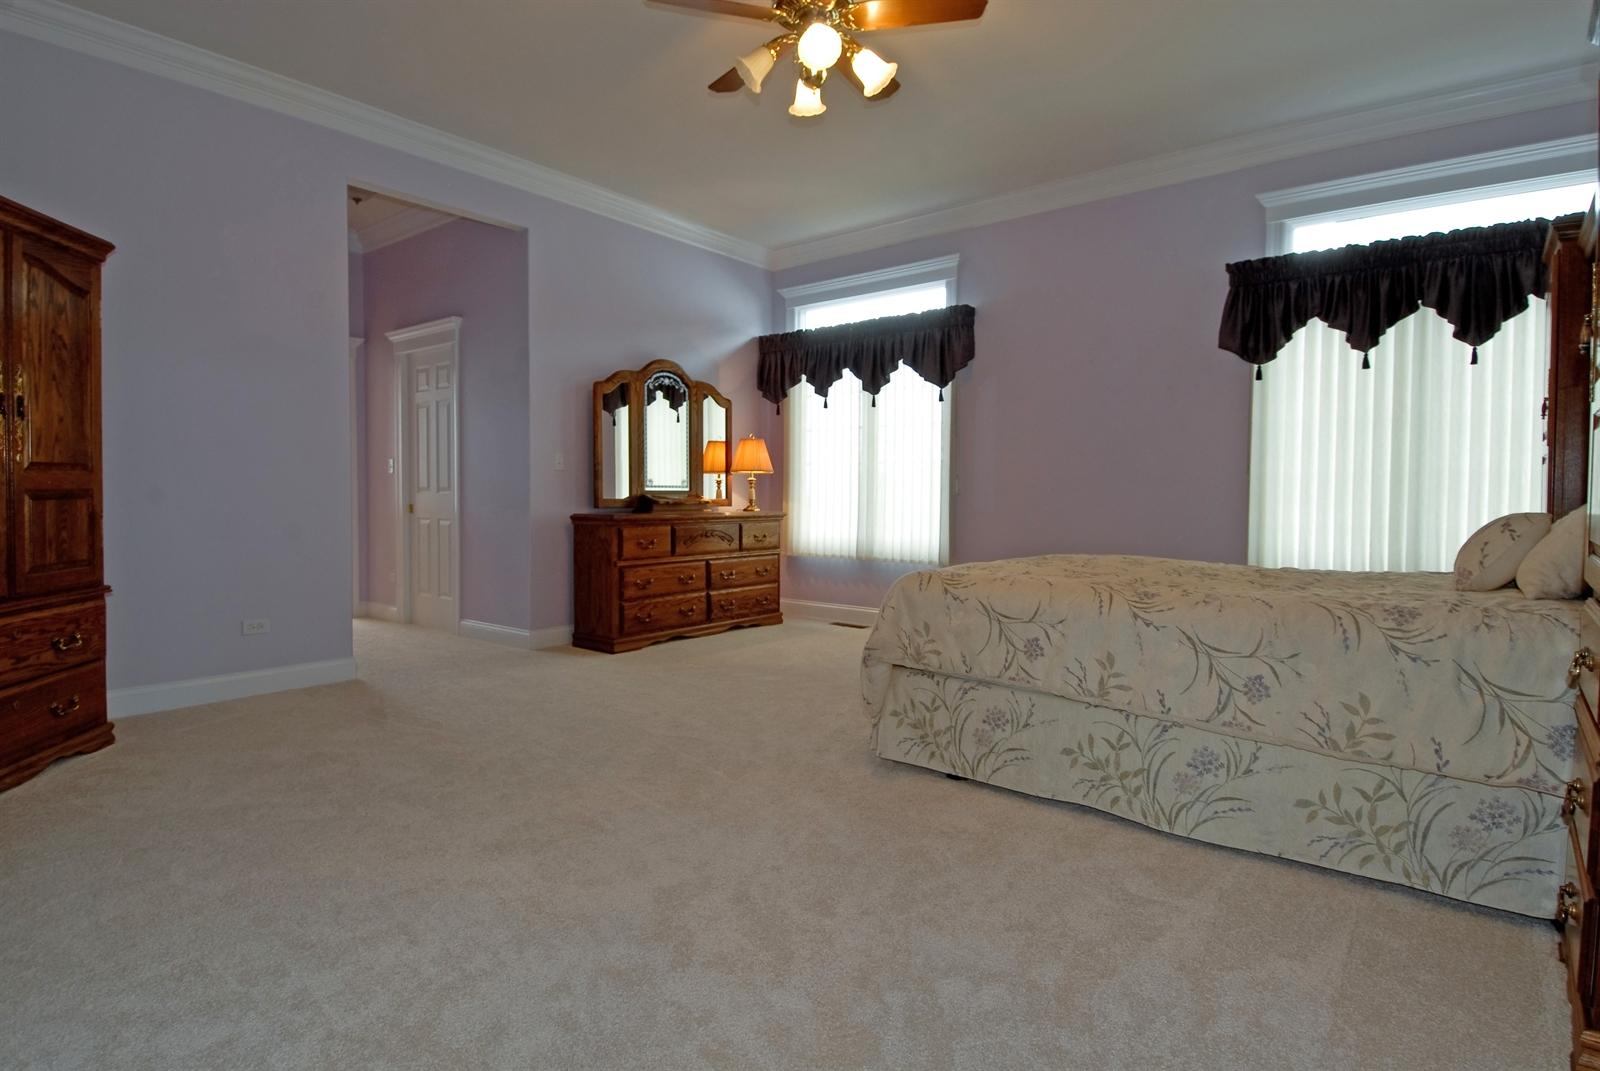 Real Estate Photography - 4N481 Samuel Clemens Dr, Saint Charles, IL, 60175 - Master Bedroom